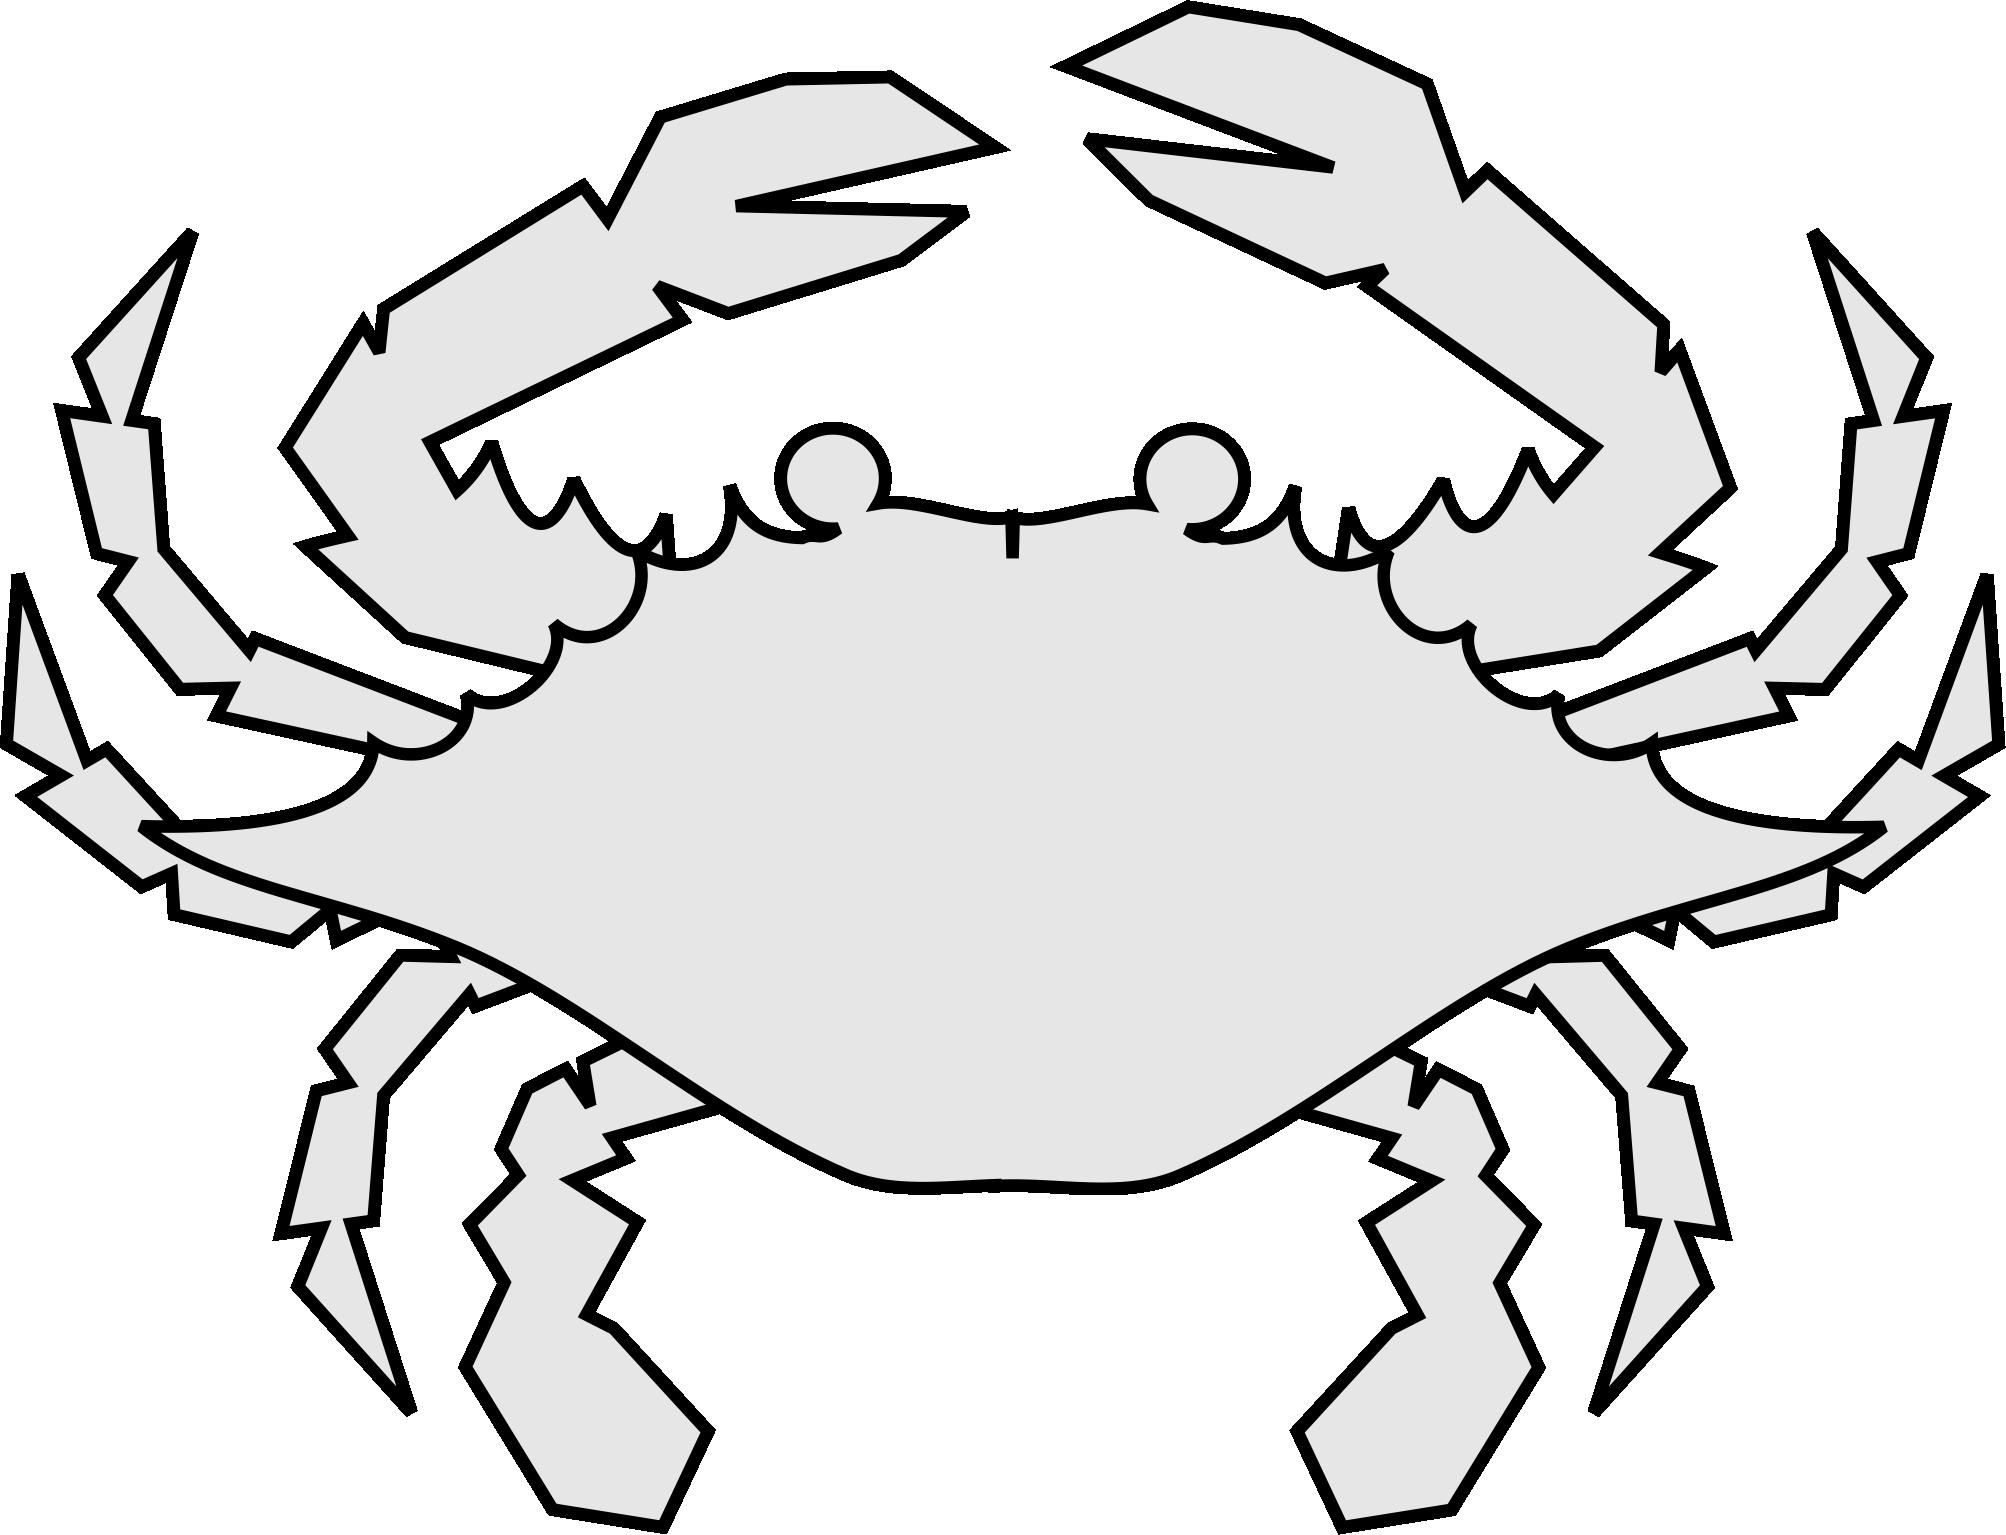 deux-part crab design